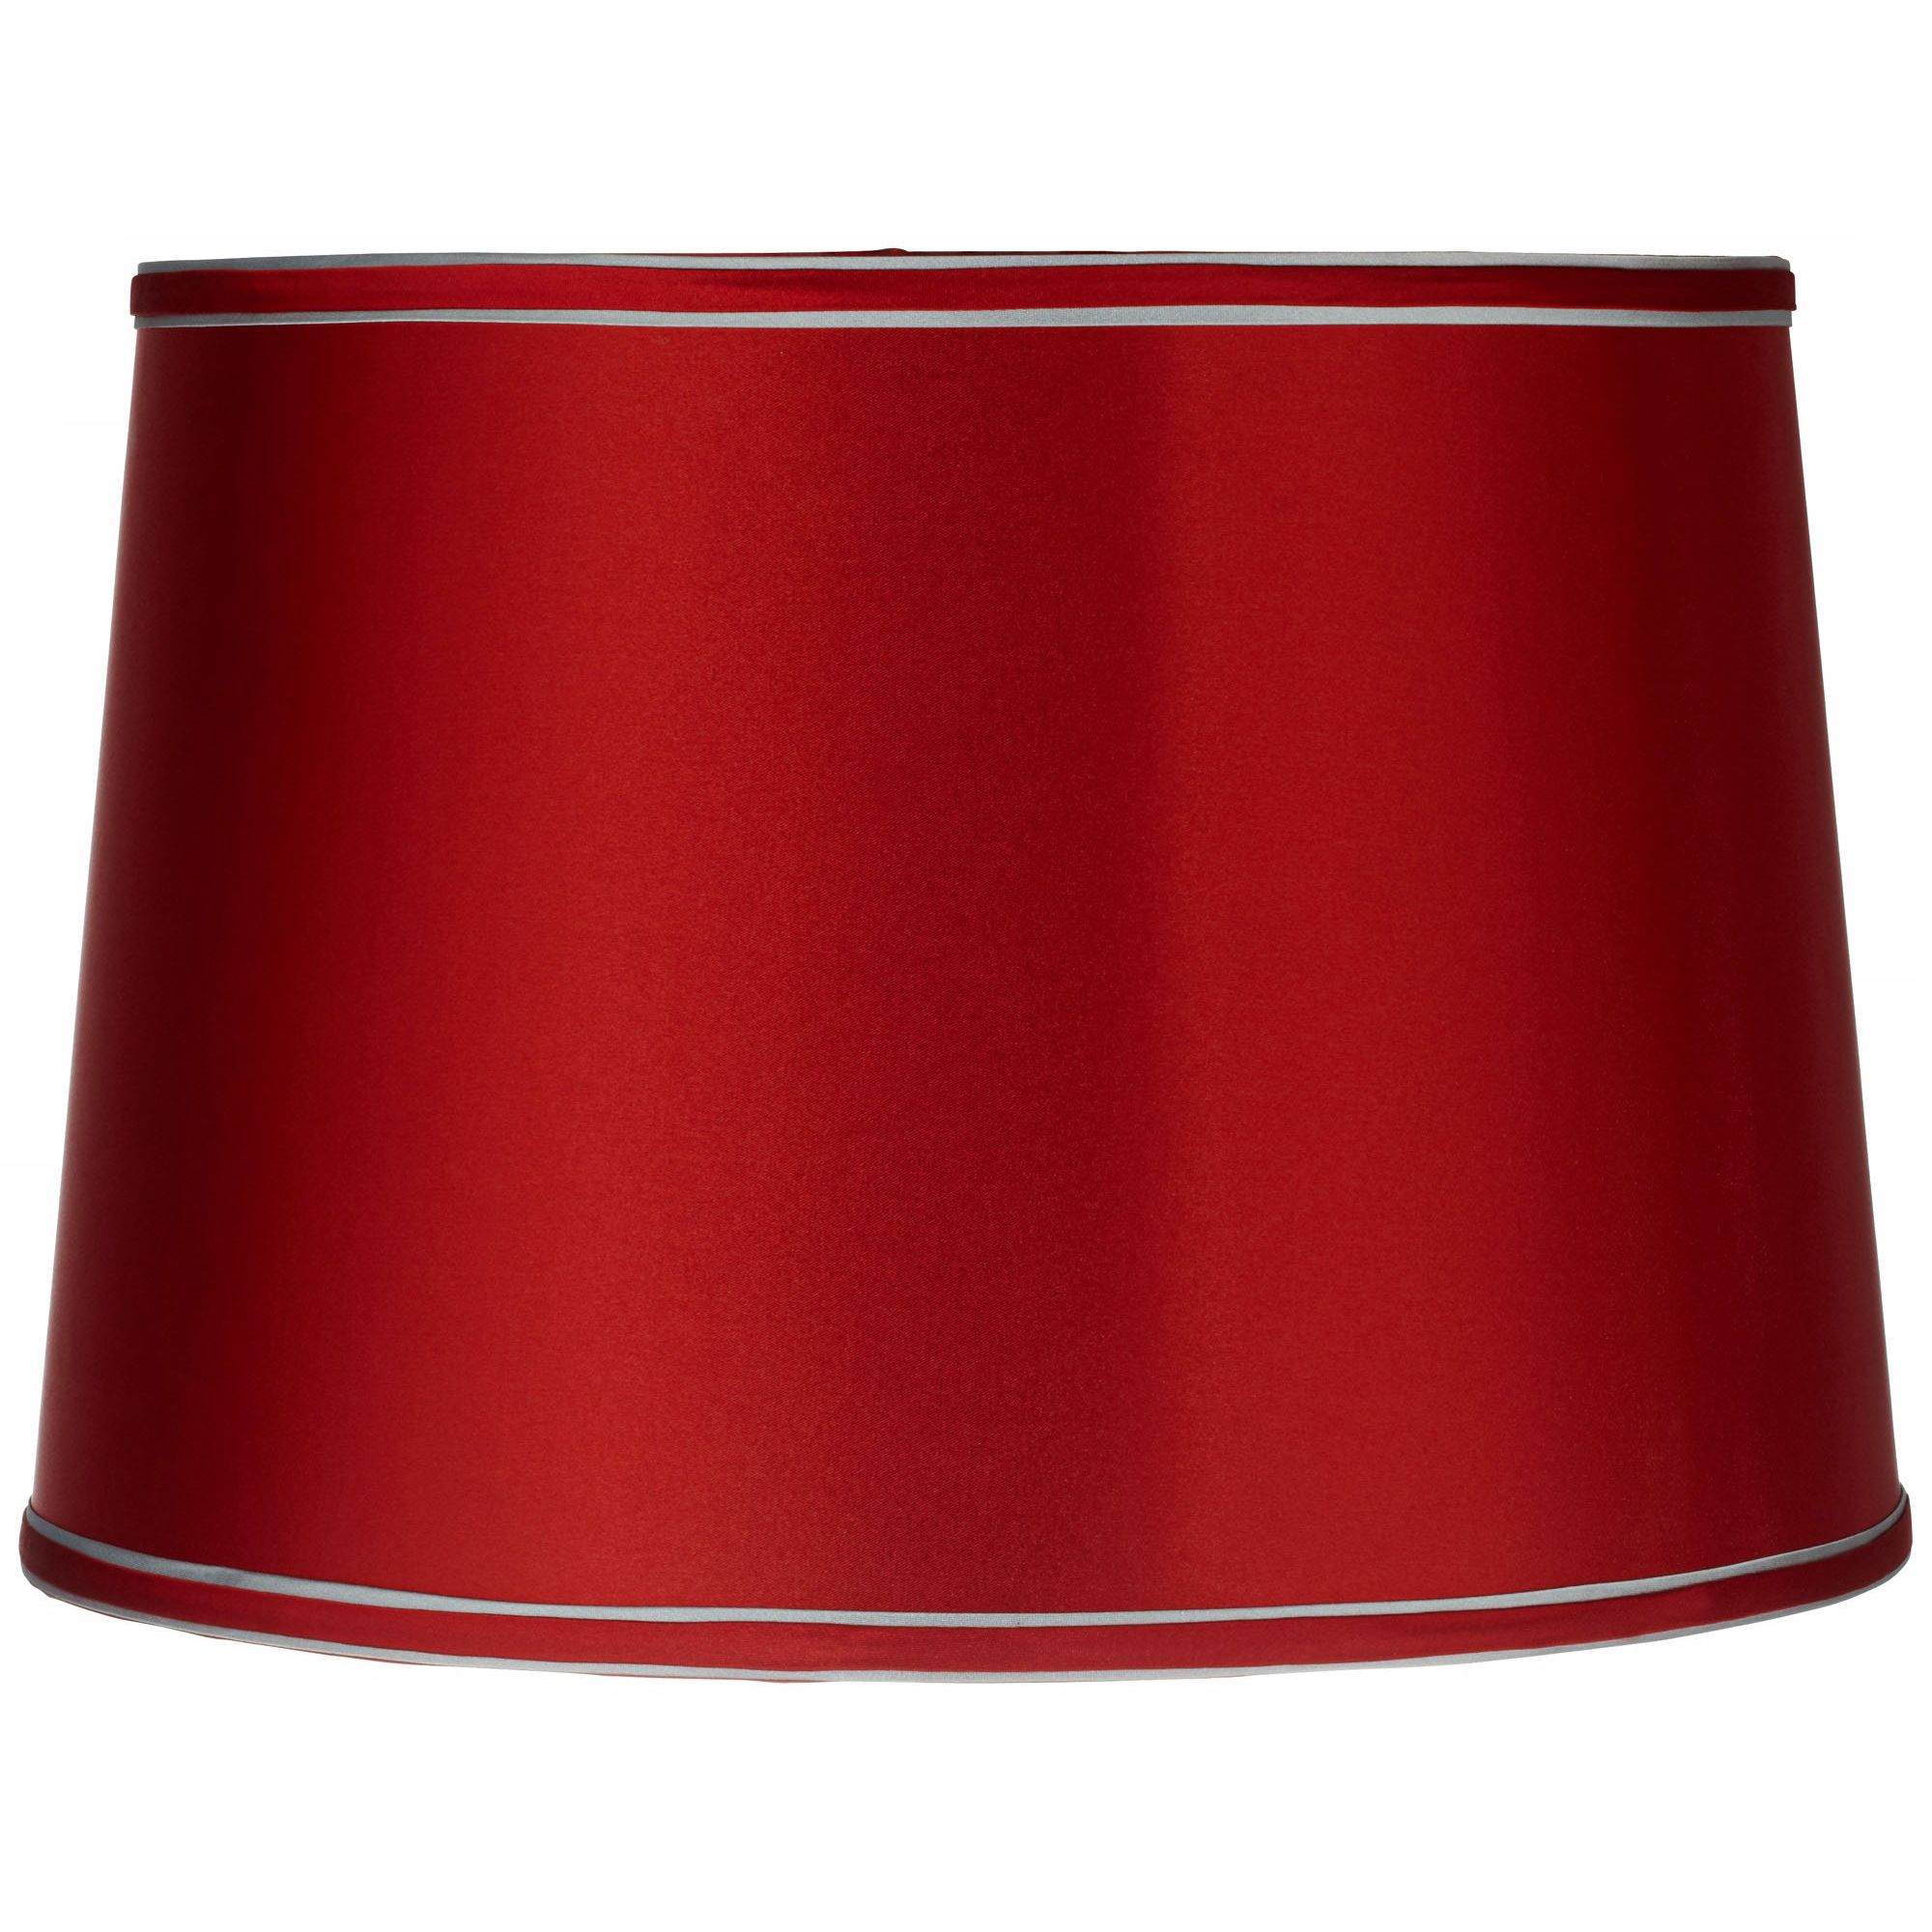 Brentwood Sydnee Satin Red Drum Lamp Shade 14x16x11 (Spider)